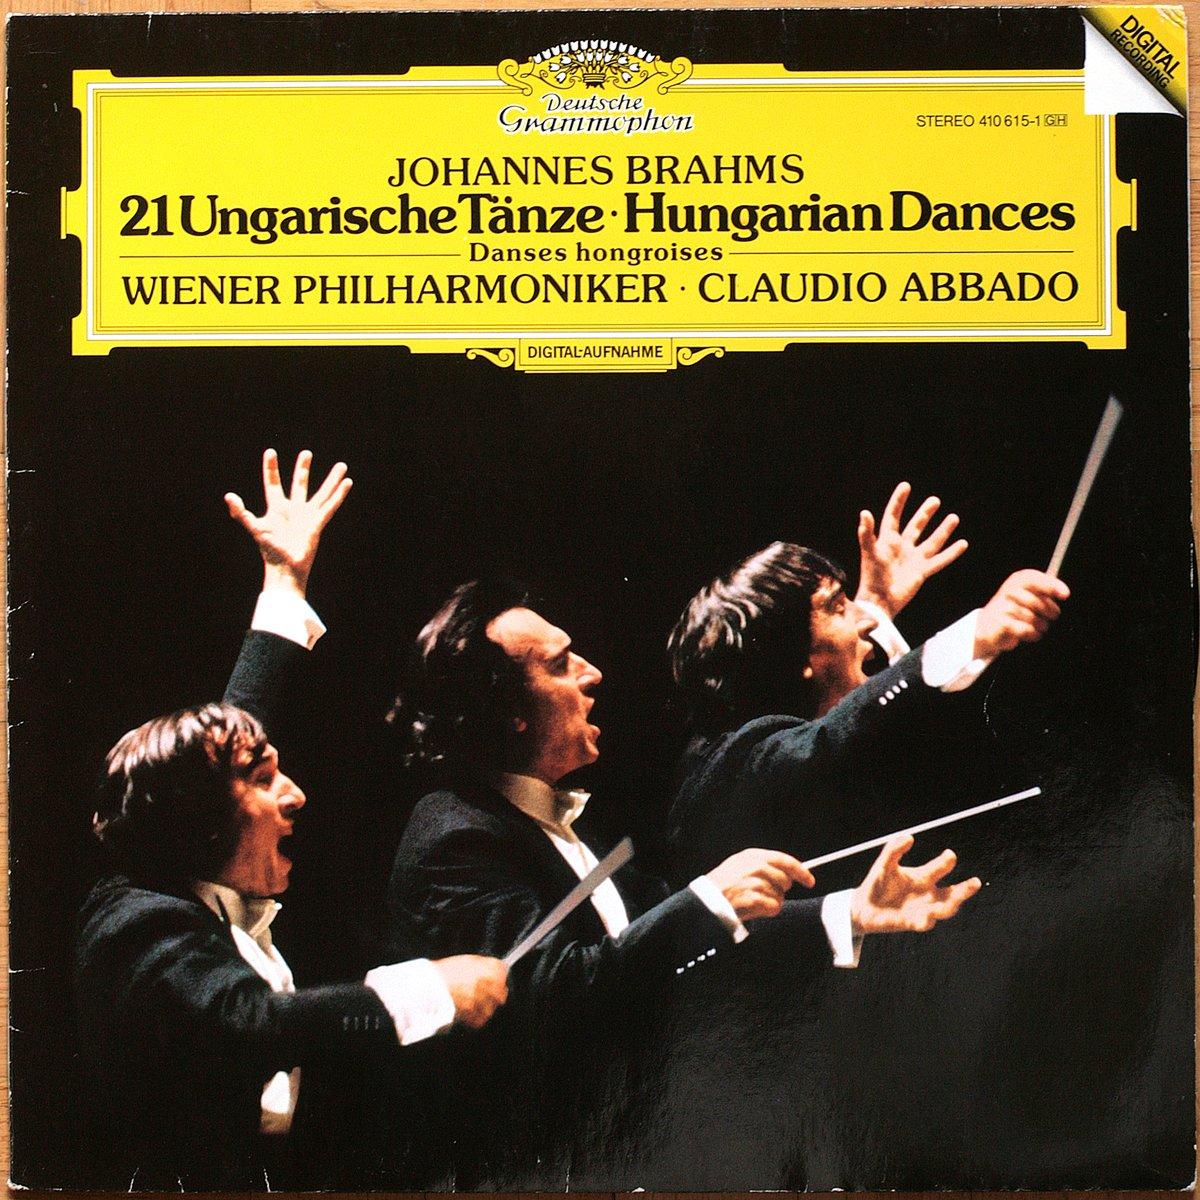 DGG 410 615 Ungarische Tanze Abbado DGG Digital Aufnahme